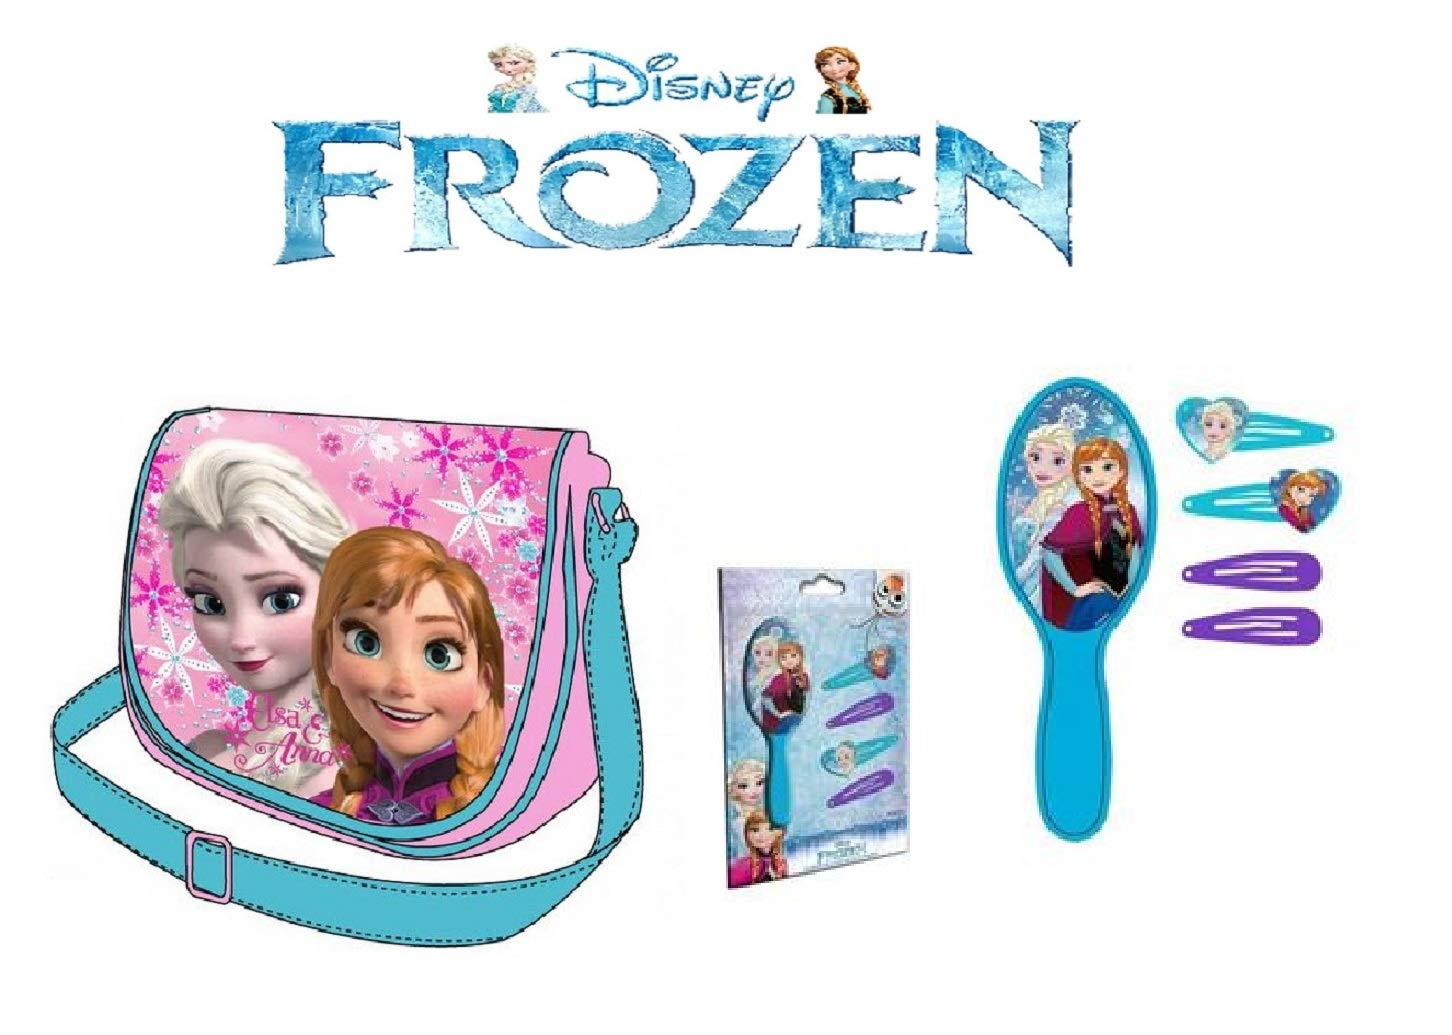 Disney Bolsa de Hombro Frozen + adorno para el cabello ...